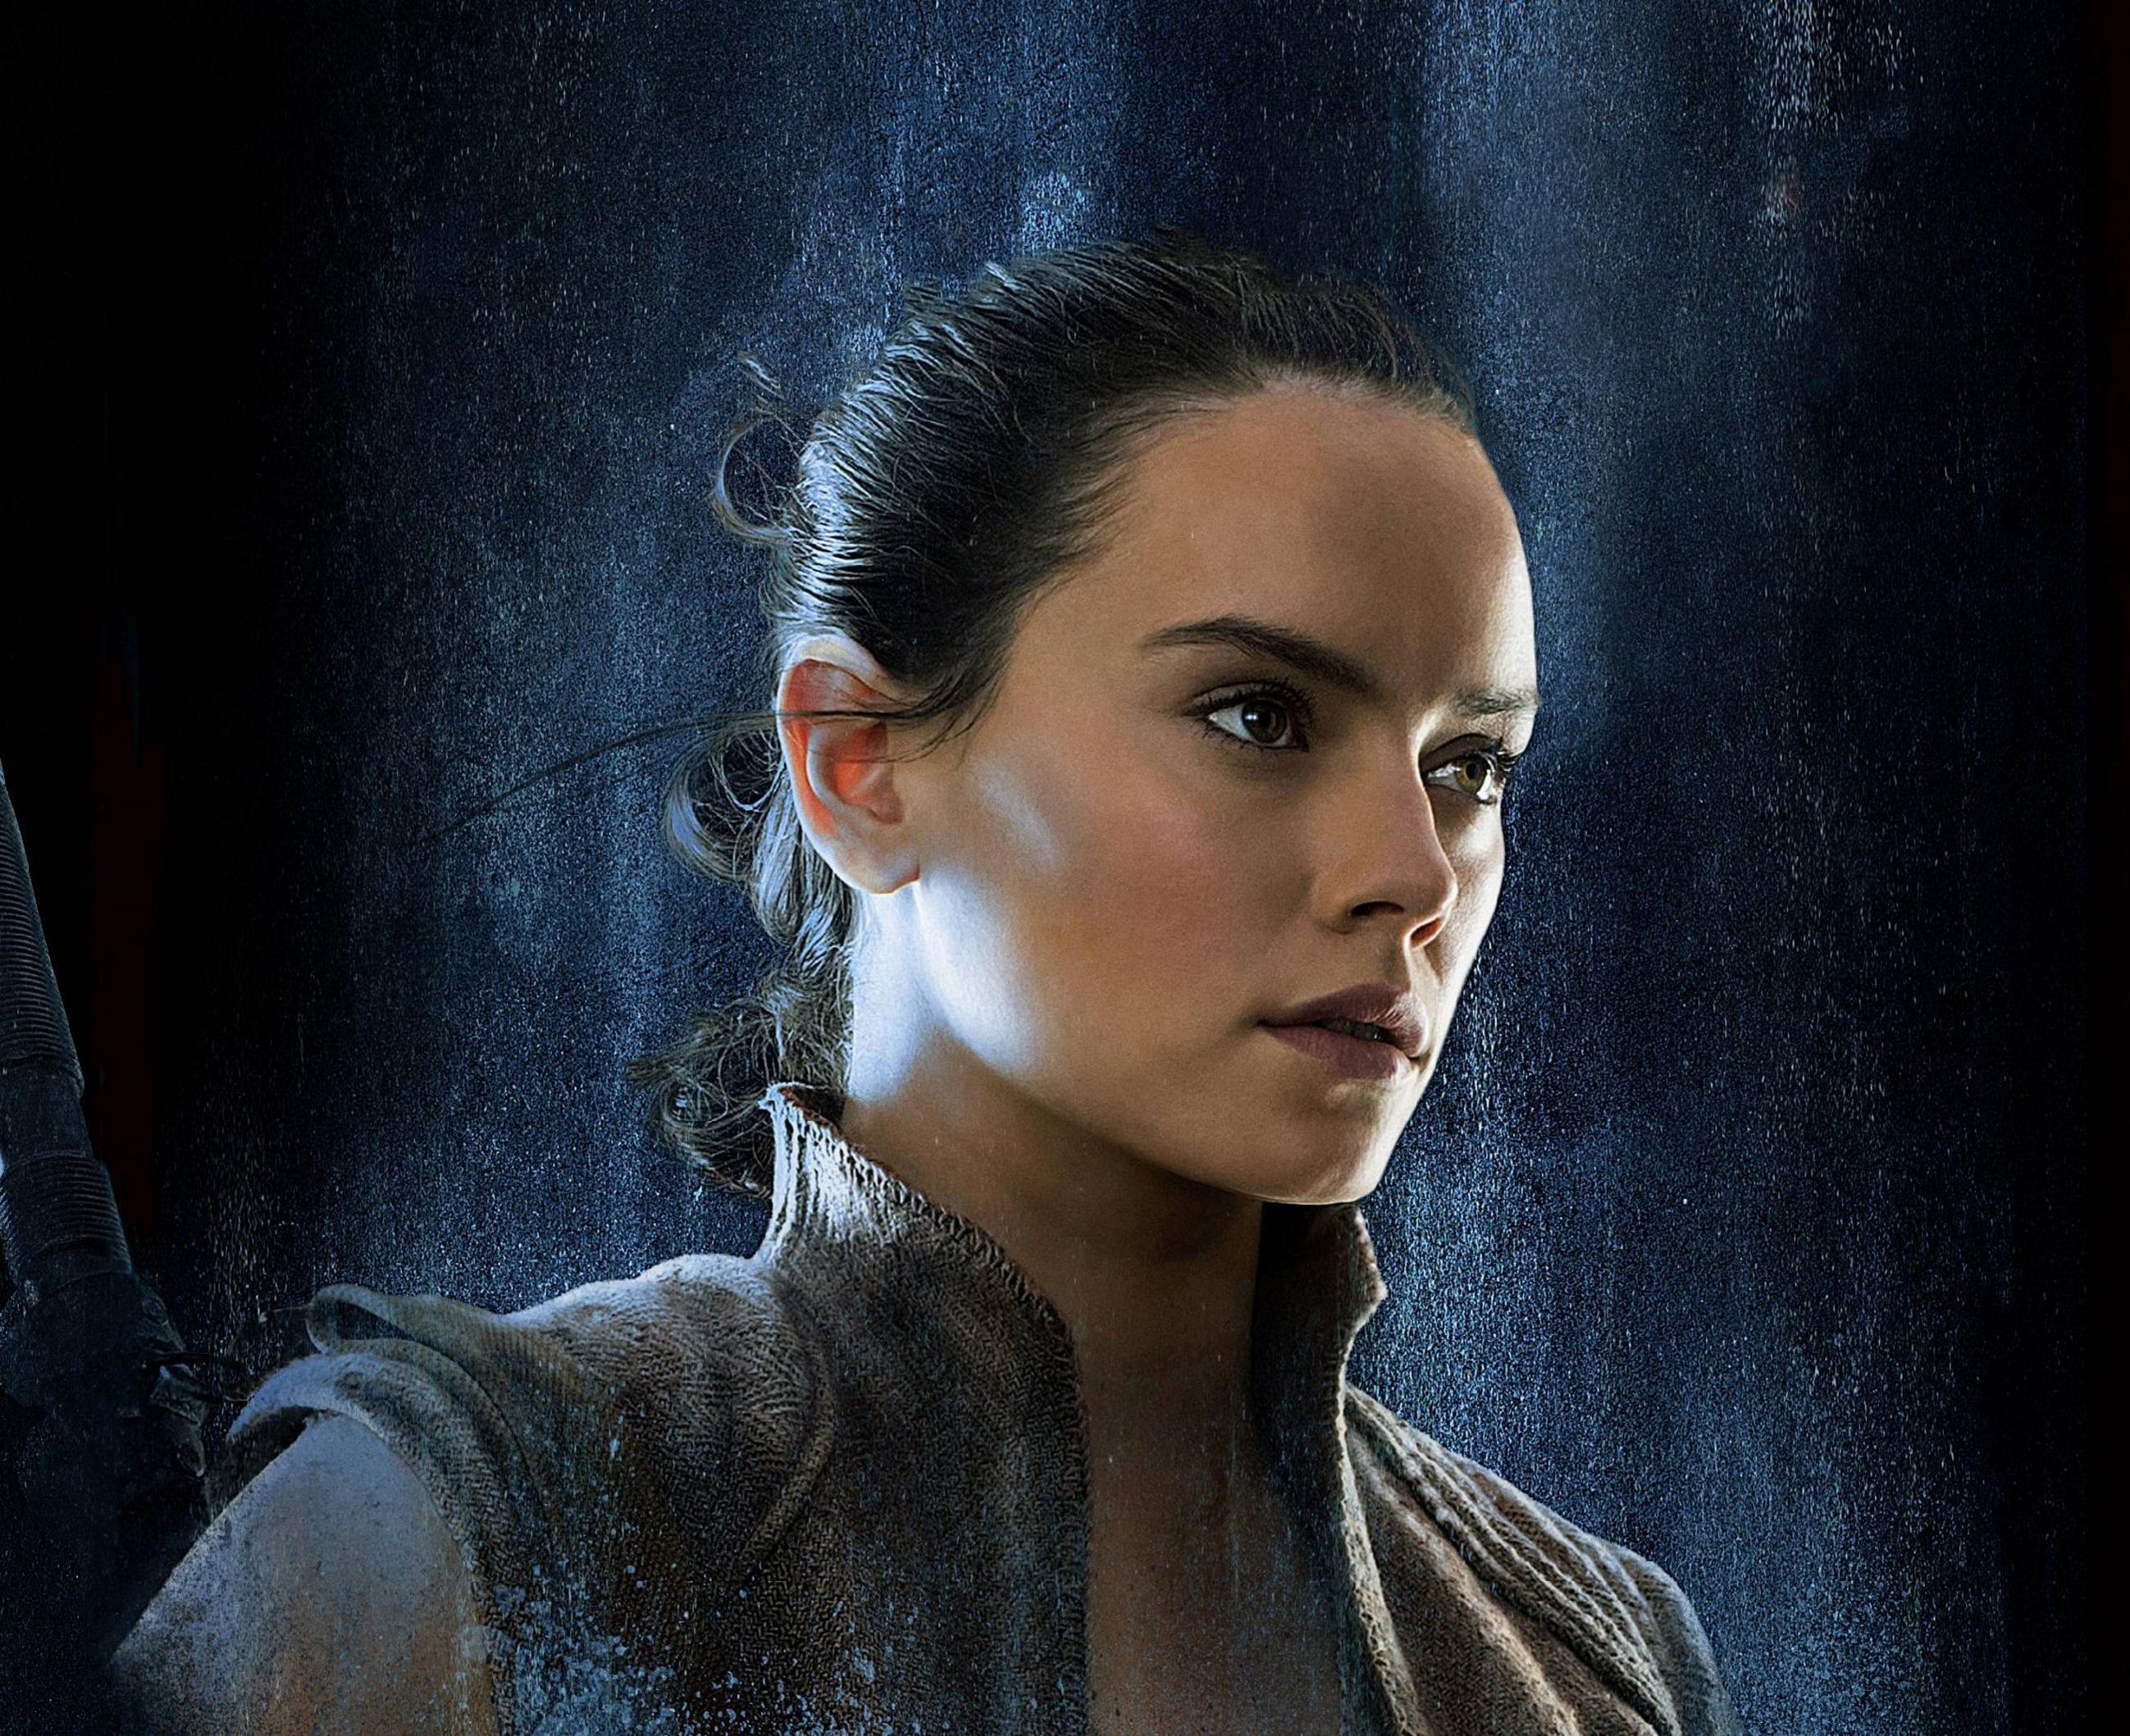 Star Wars The Last Jedi Daisy Ridley Rey 2k Wallpaper Hdwallpaper Desktop Rey Star Wars Star Wars Watch Daisy Ridley Star Wars